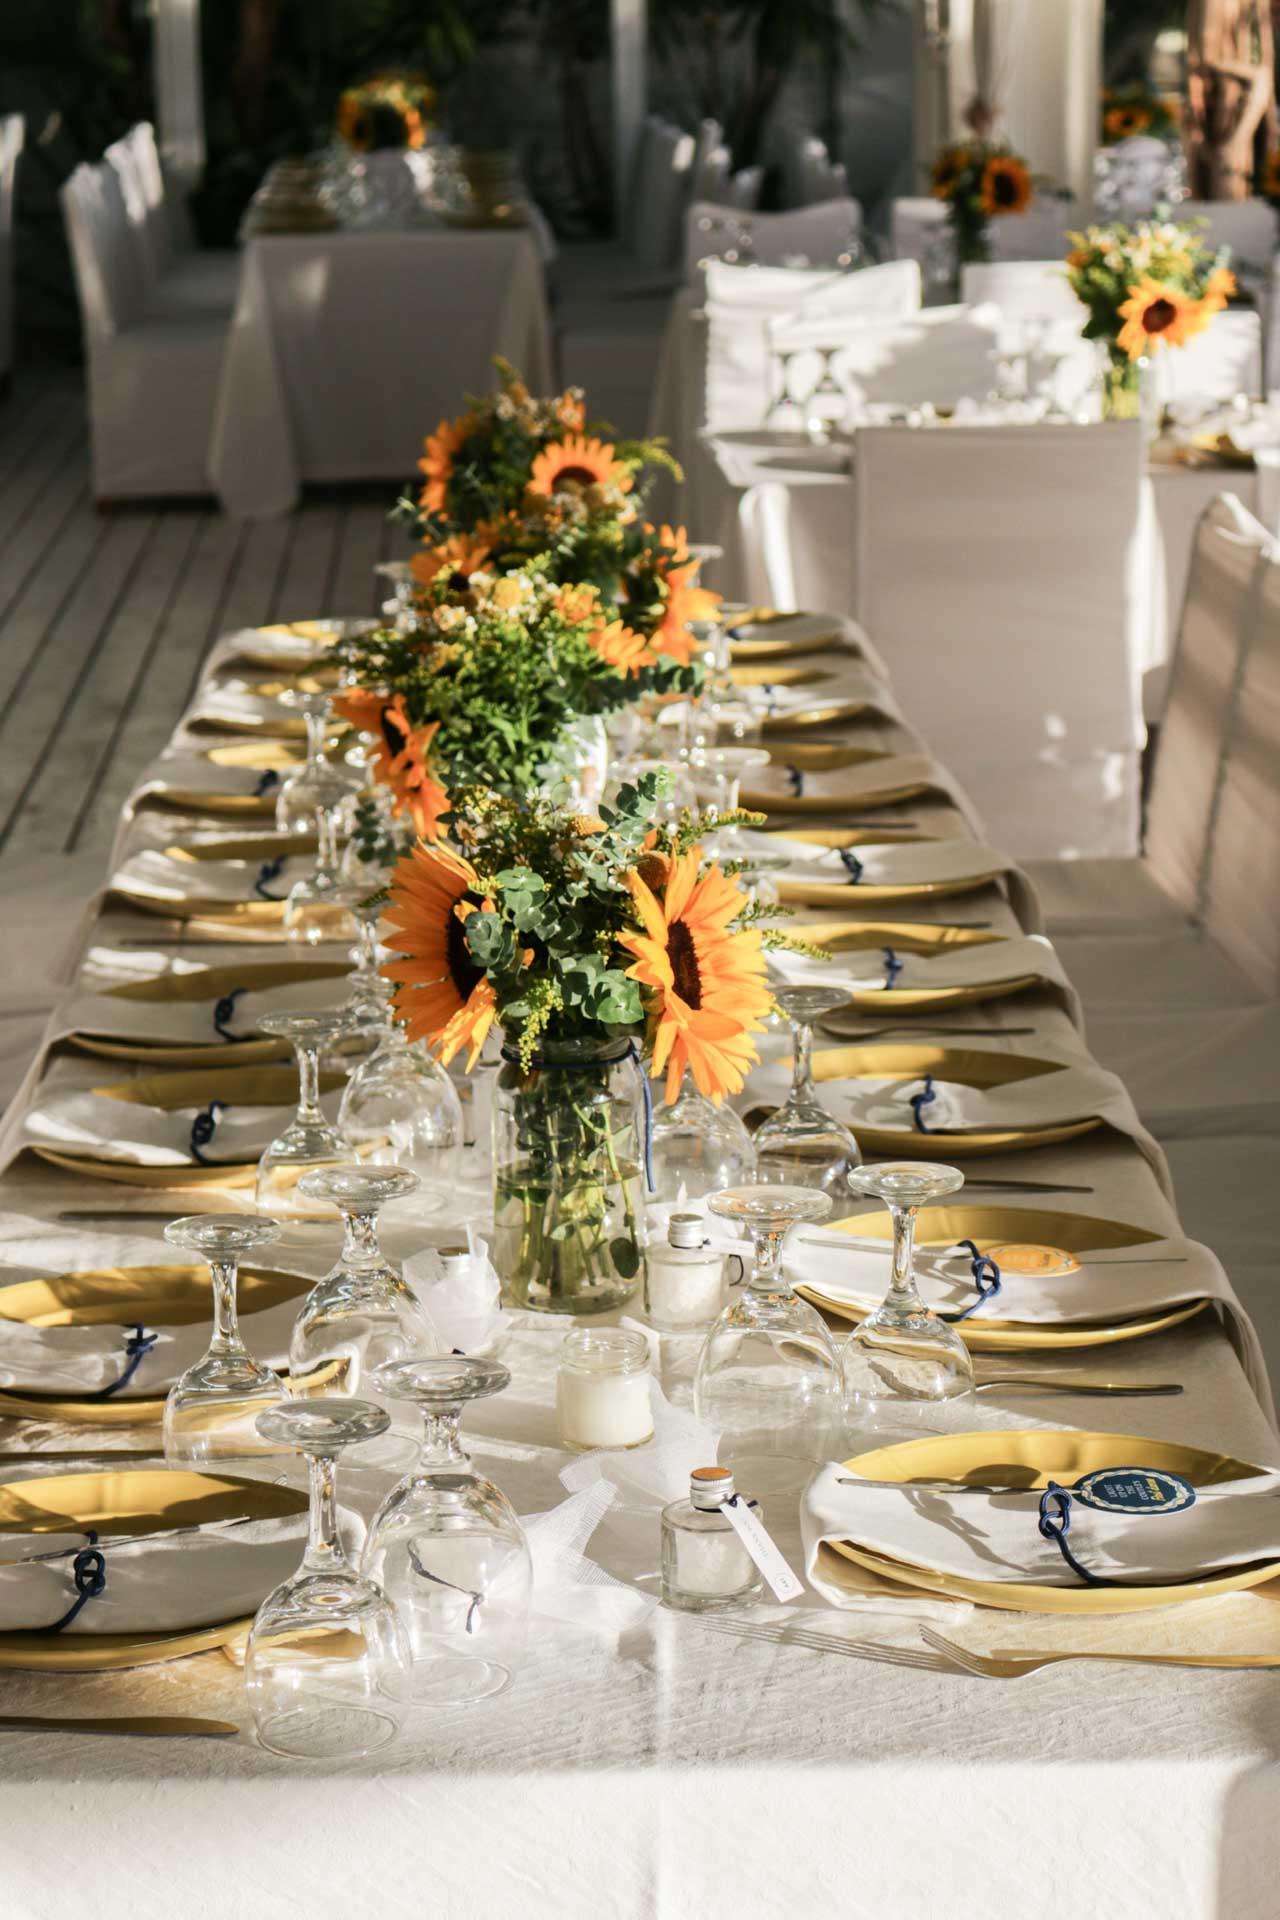 naxos-weddings-events-santana-beach-3